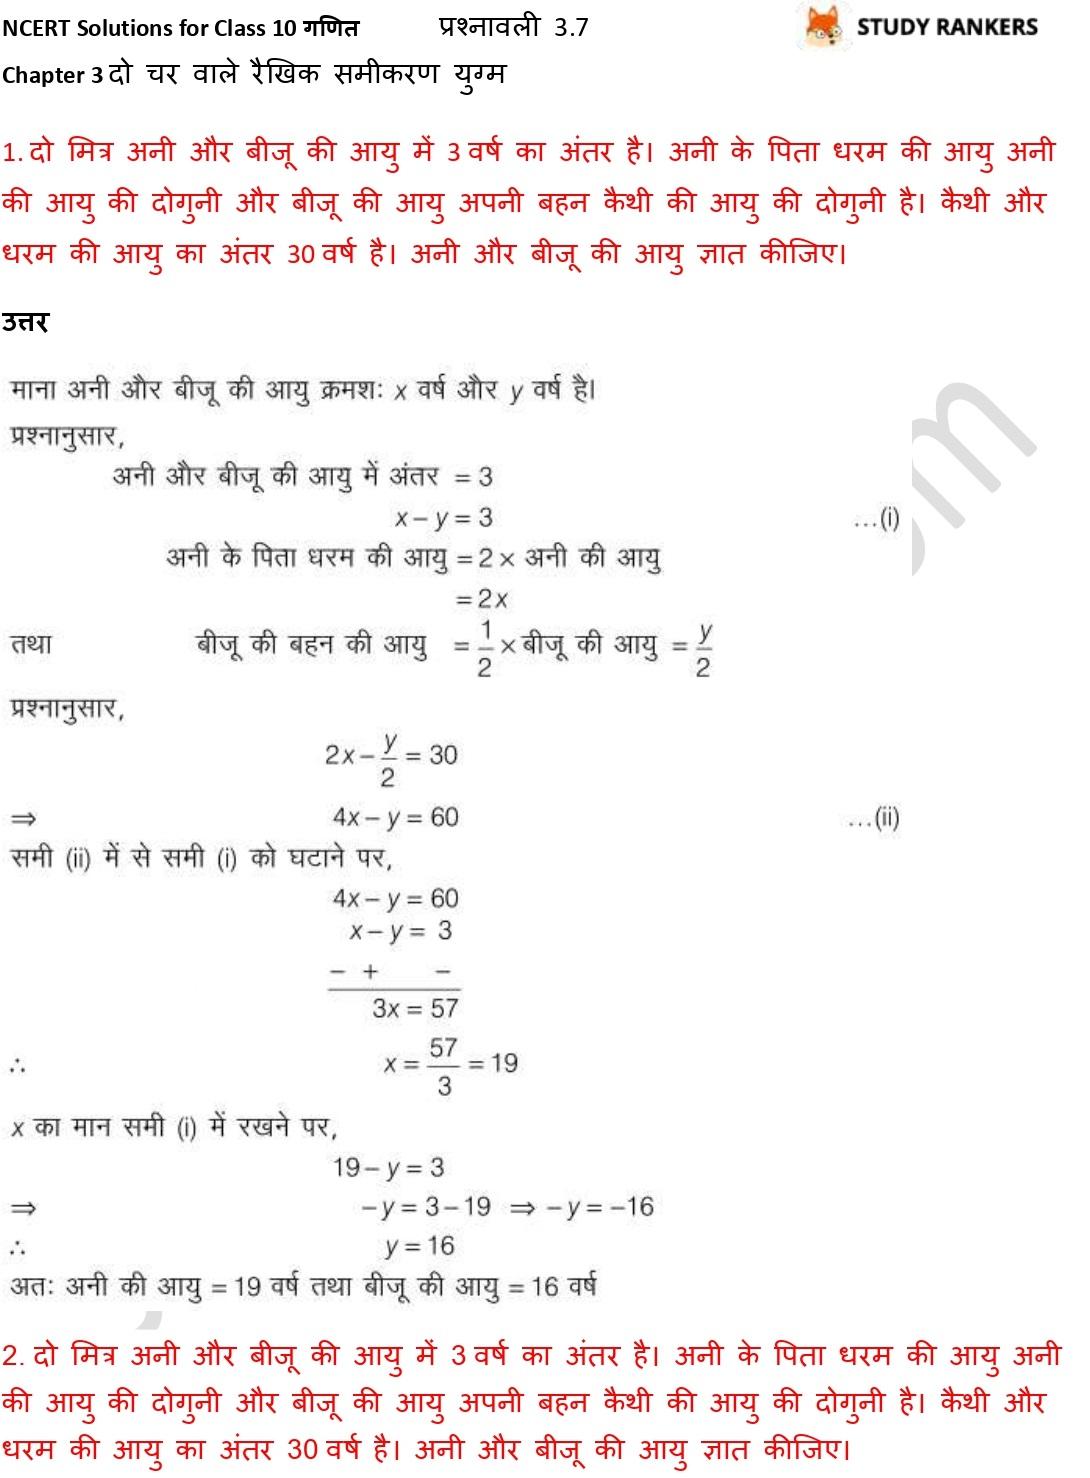 NCERT Solutions for Class 10 Maths Chapter 3 दो चर वाले रैखिक समीकरण युग्म प्रश्नावली 3.7 Part 1